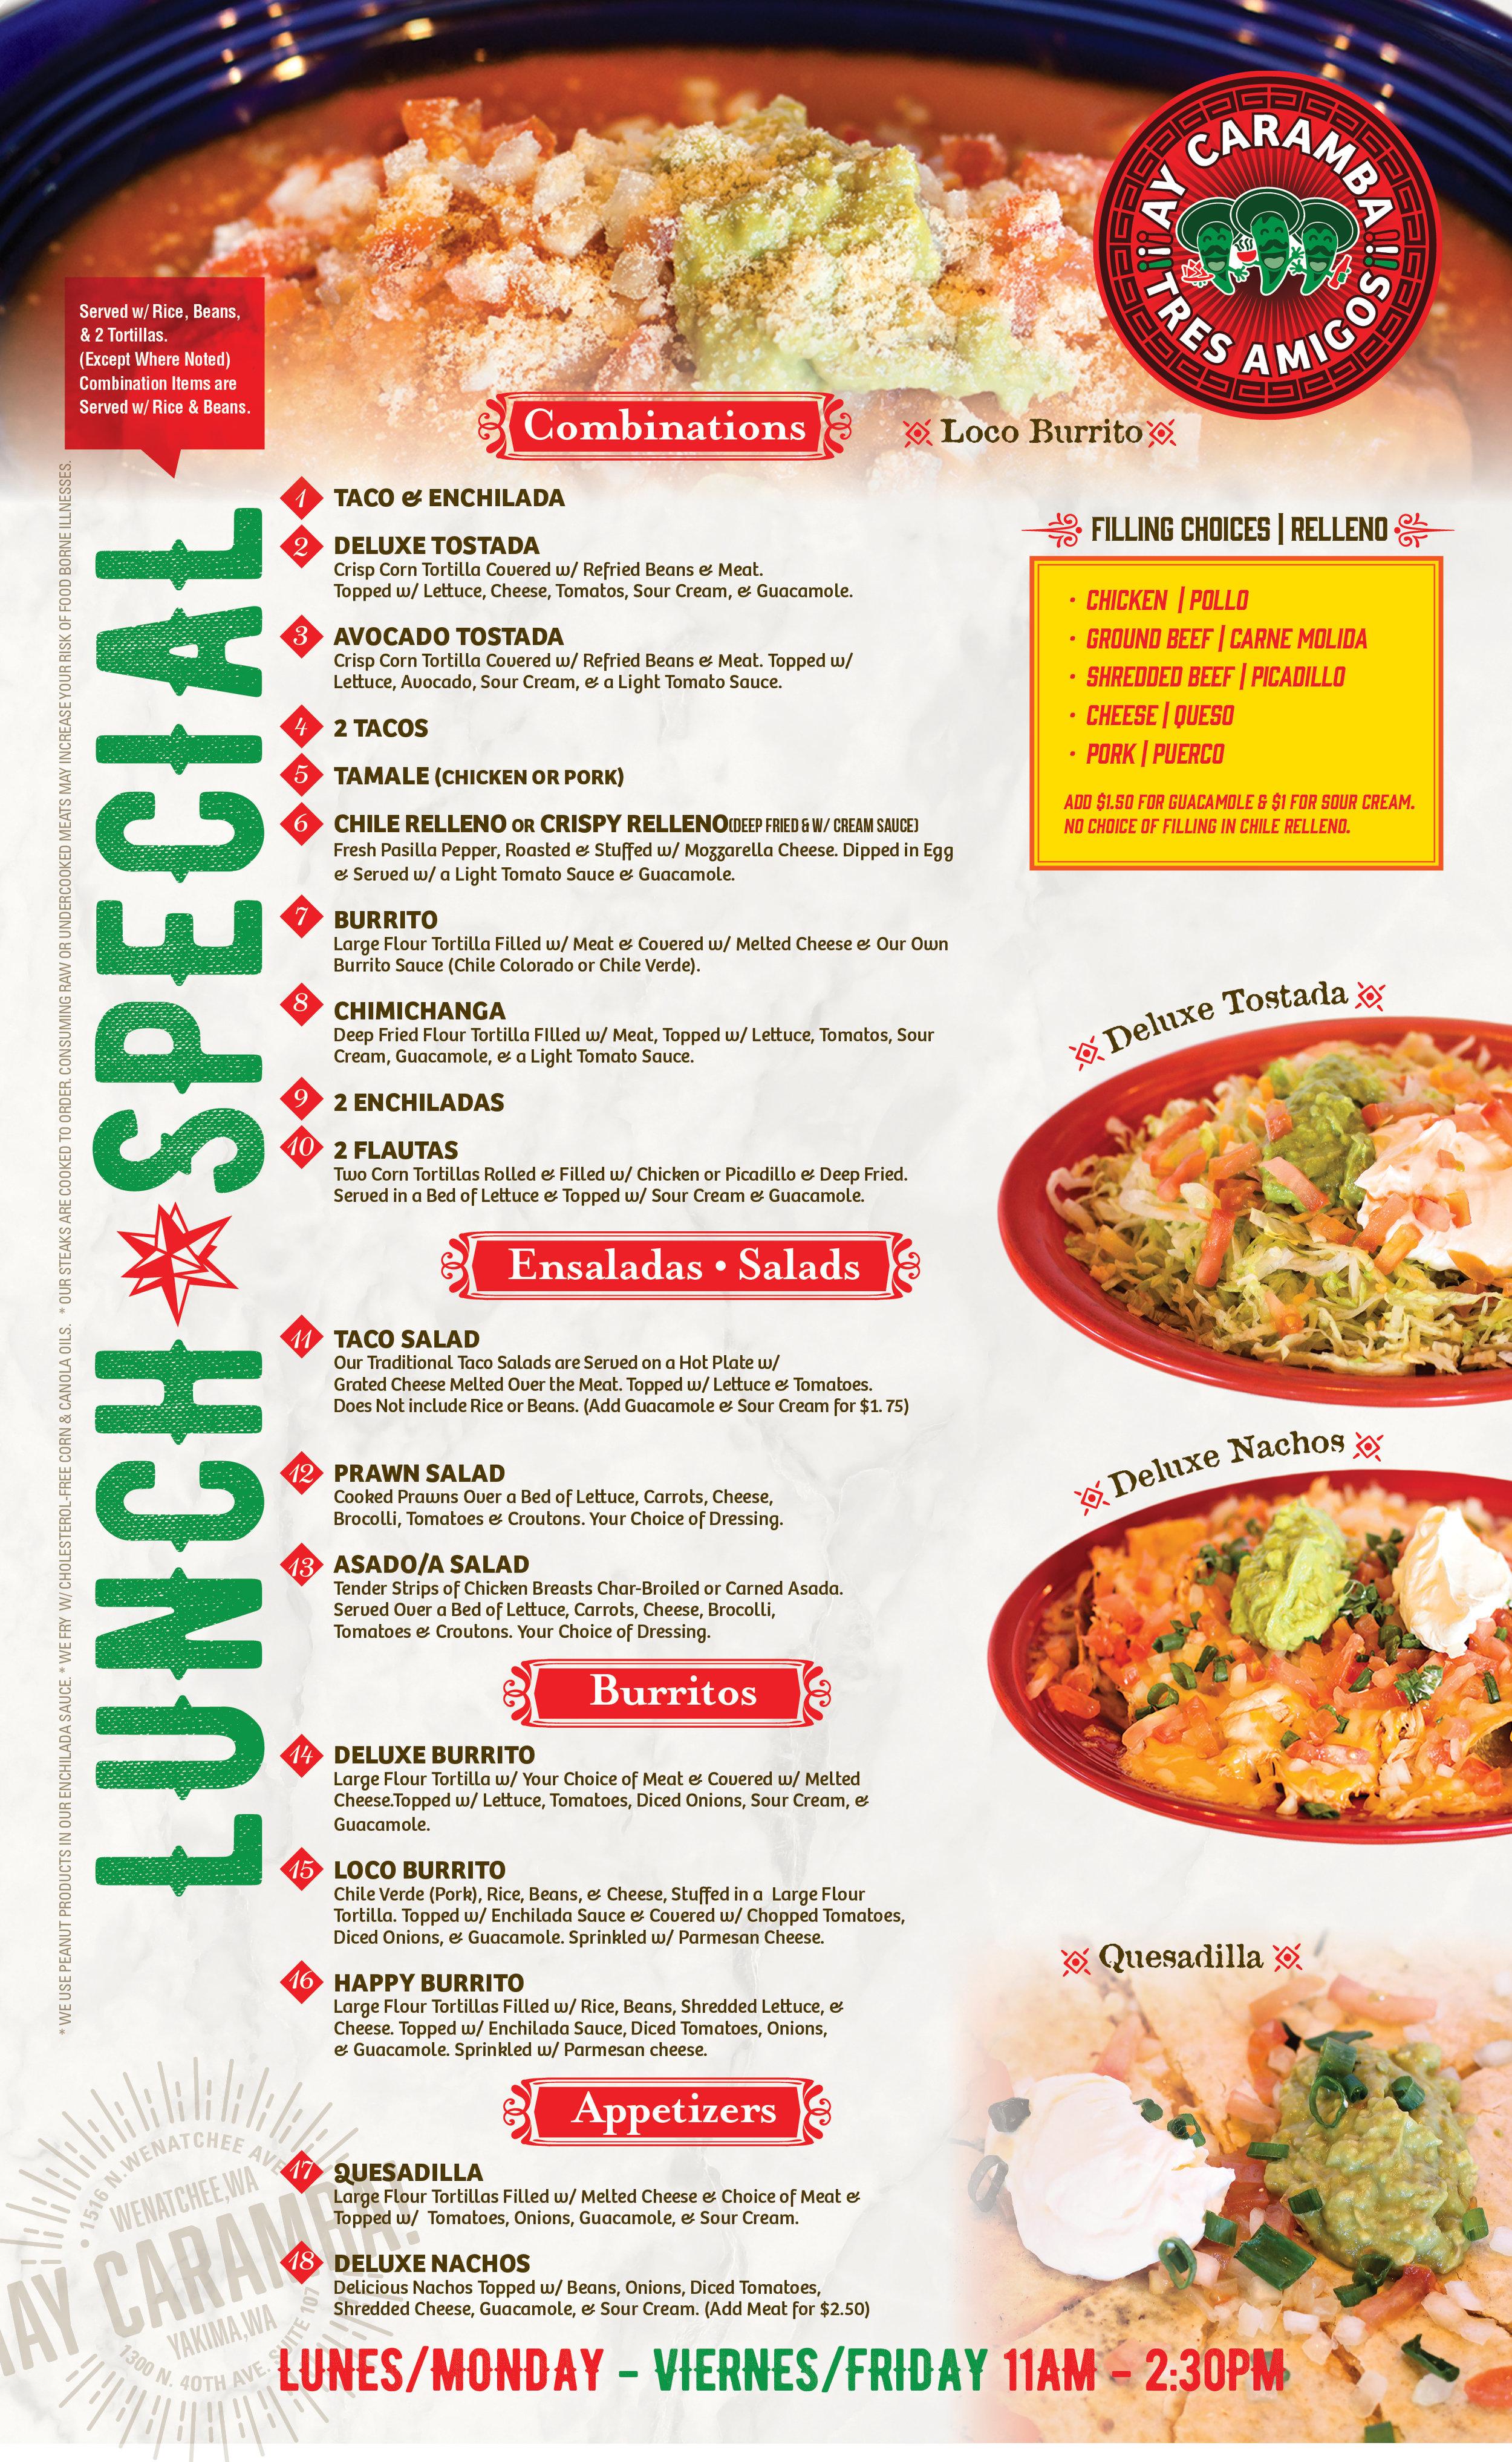 Ay Caramba_Wenatchee_Lunch Special Menu.jpg